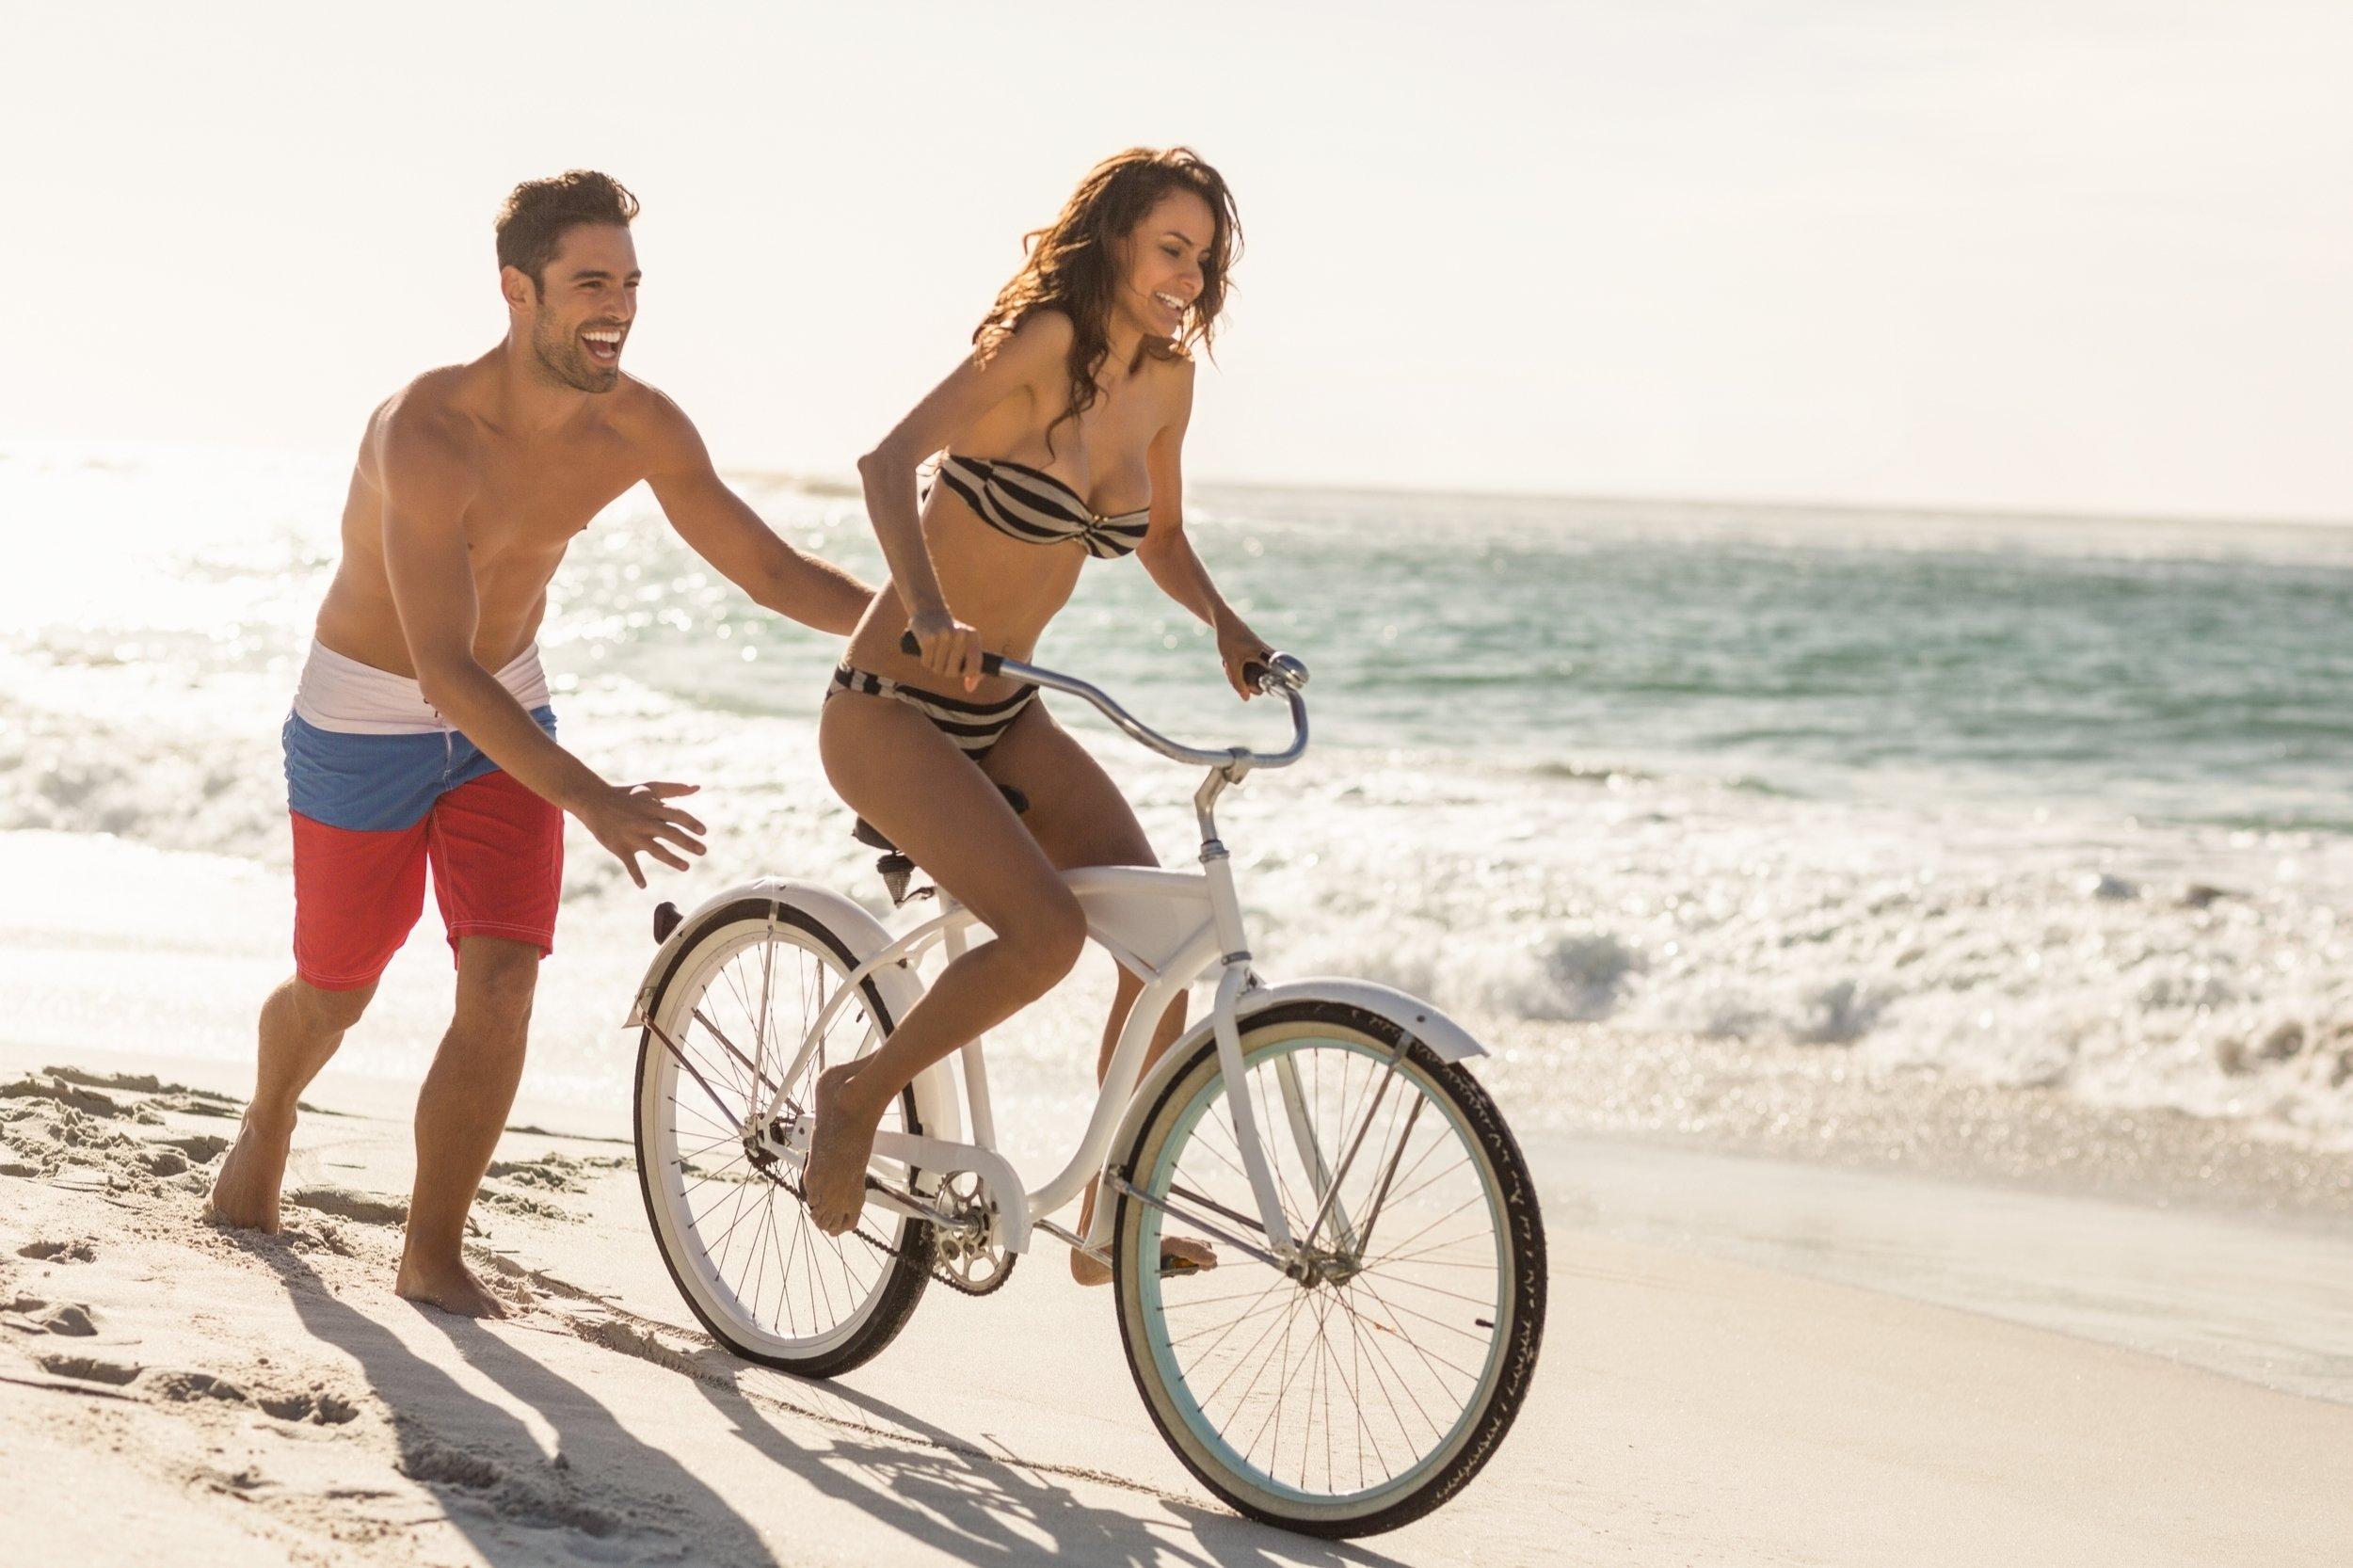 10 Stylish Fun Date Ideas San Diego 40 date ideas in san diego north county first date or date night ync 1 2020